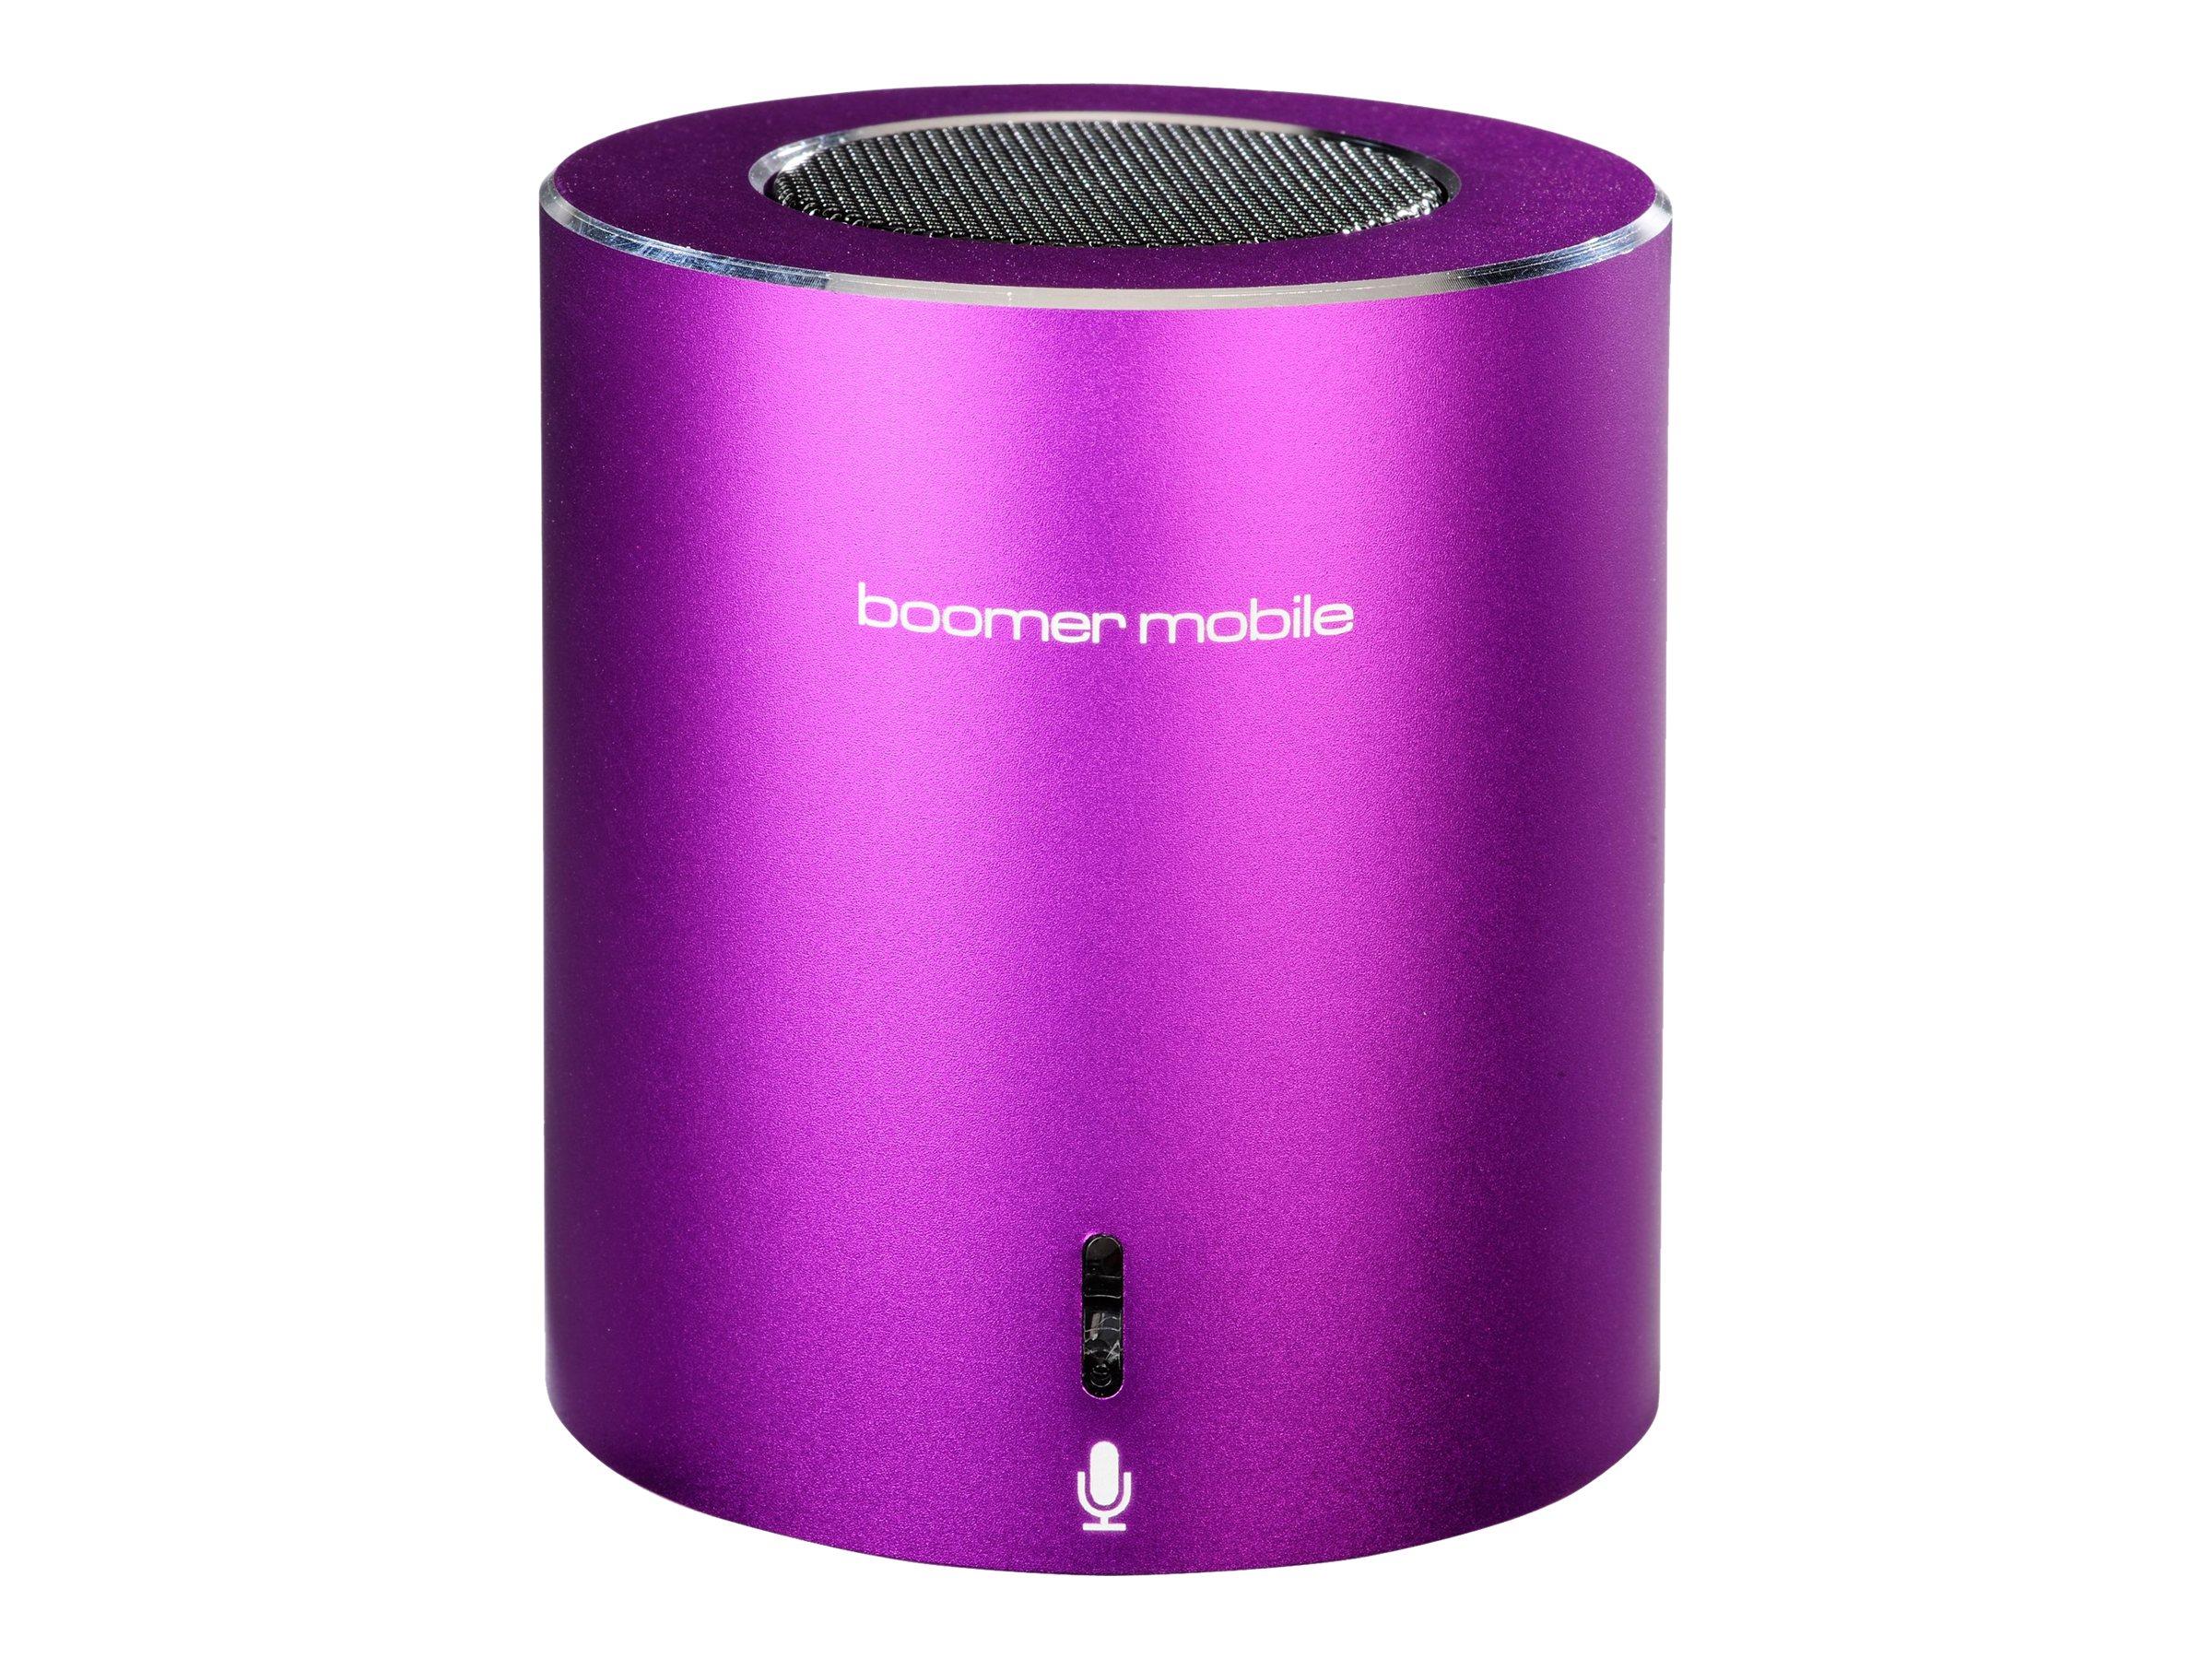 Ultron Aktivbox boomer mobile